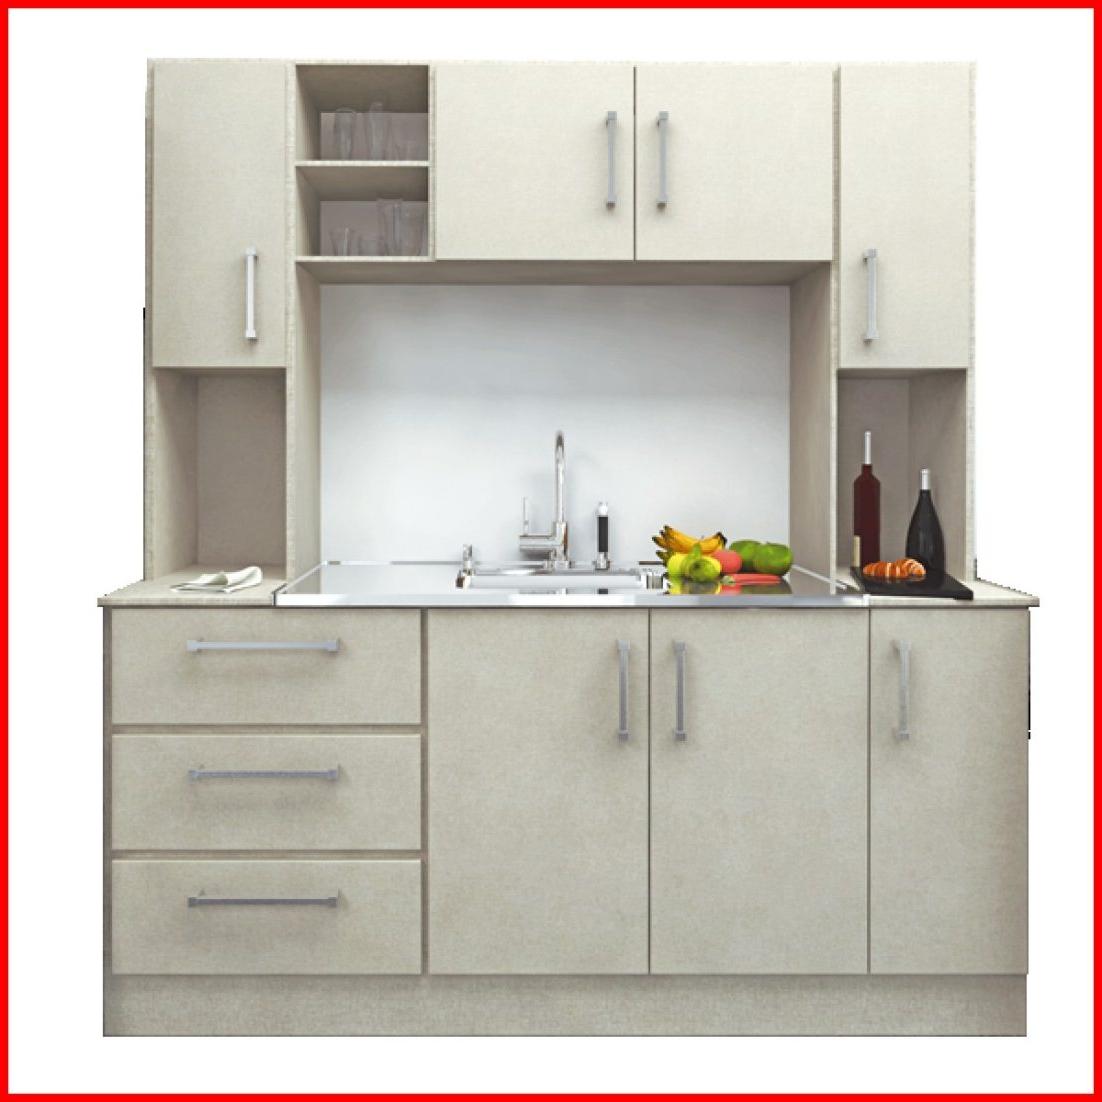 Pintar Muebles De Cocina En Blanco J7do Pintar Muebles De Cocina ...